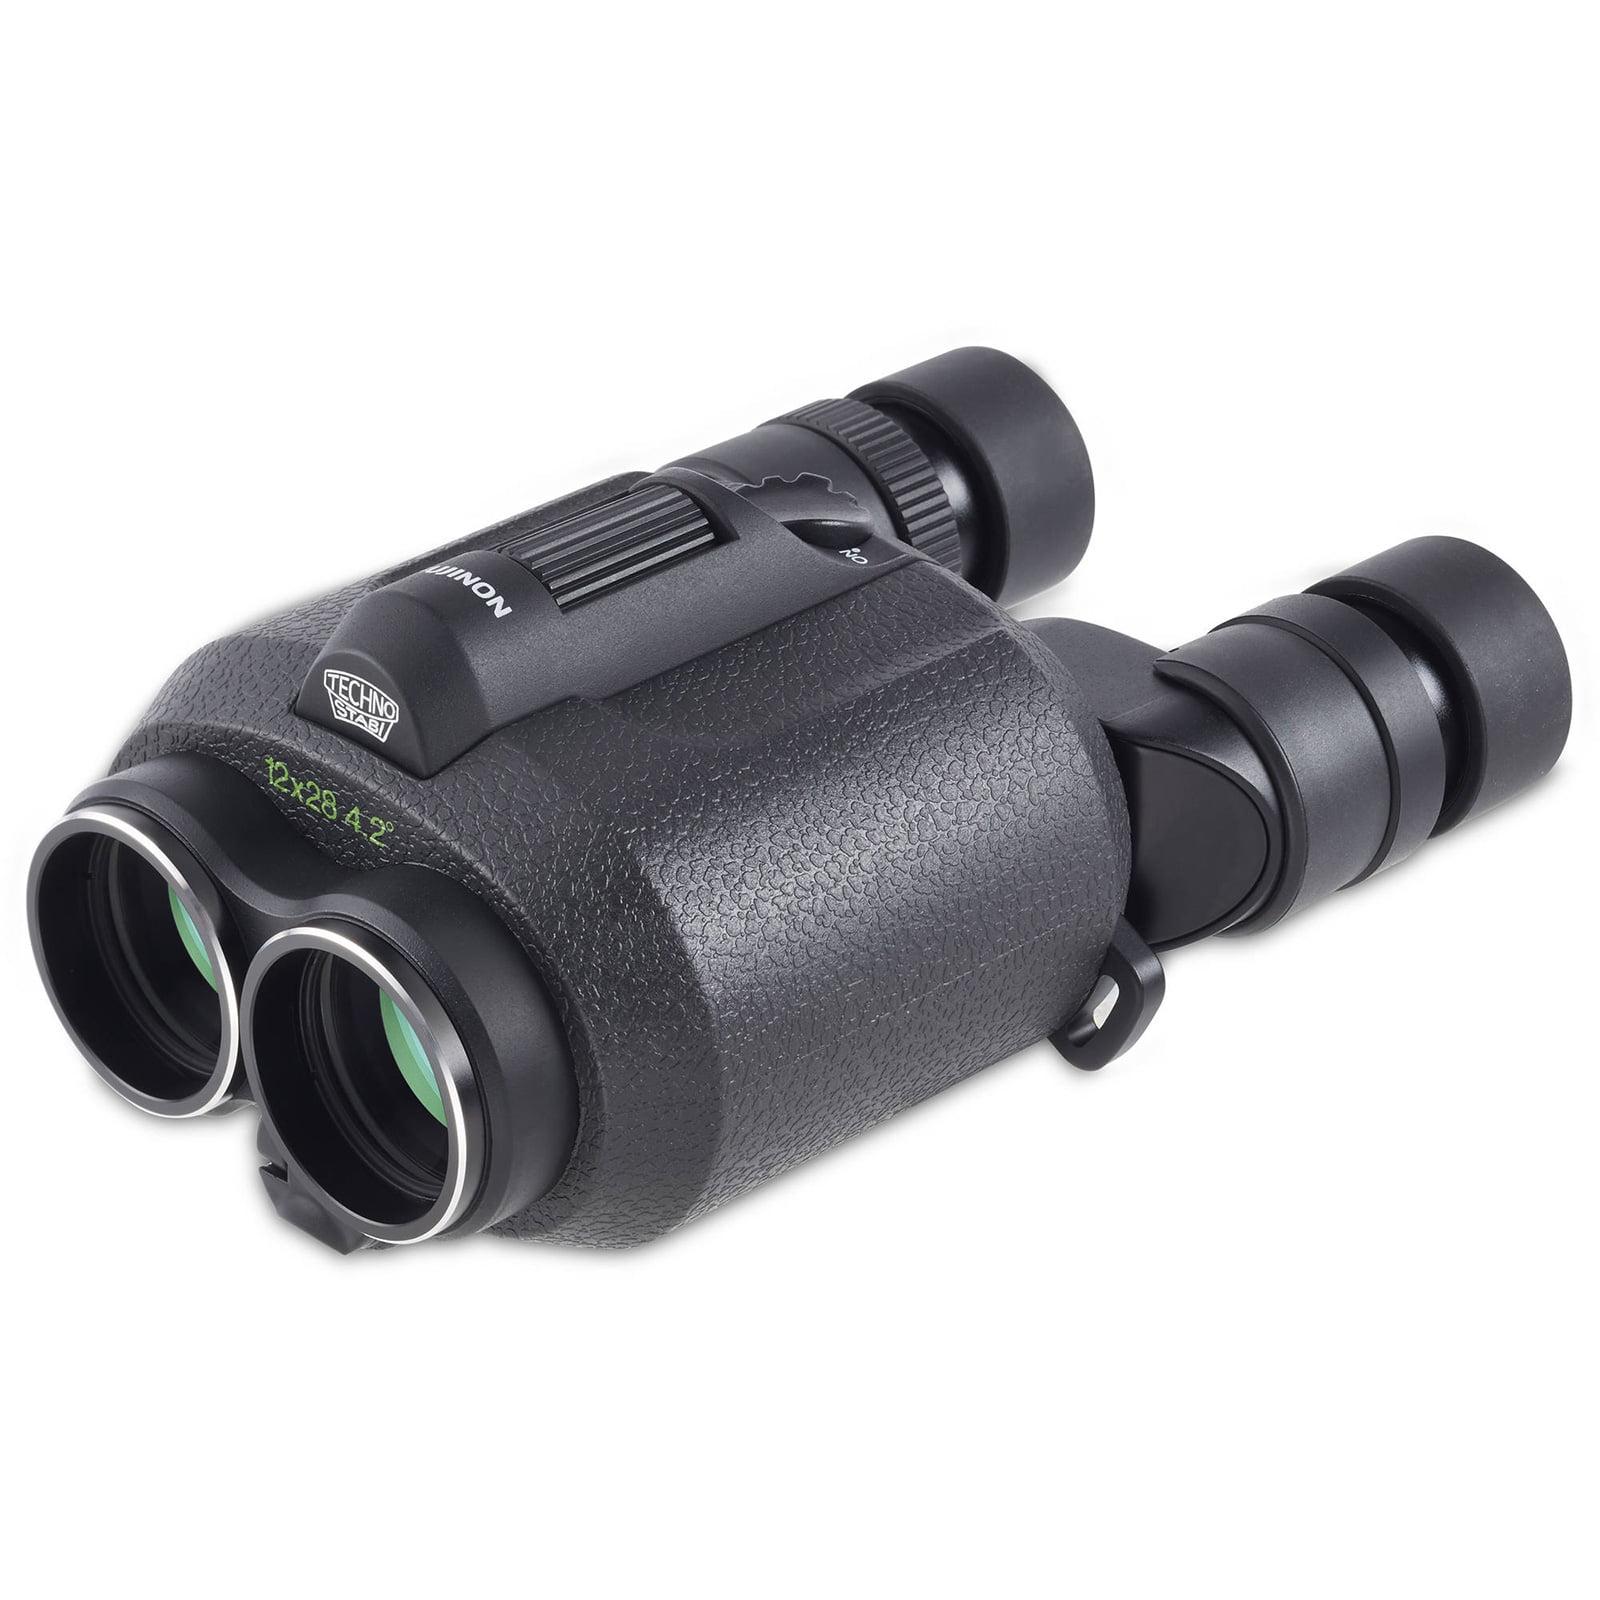 Fujifilm Fujinon Techno-Stabi TS1228 12x28 Image Stabilized Binoculars & Case Weather / Fog Resistant